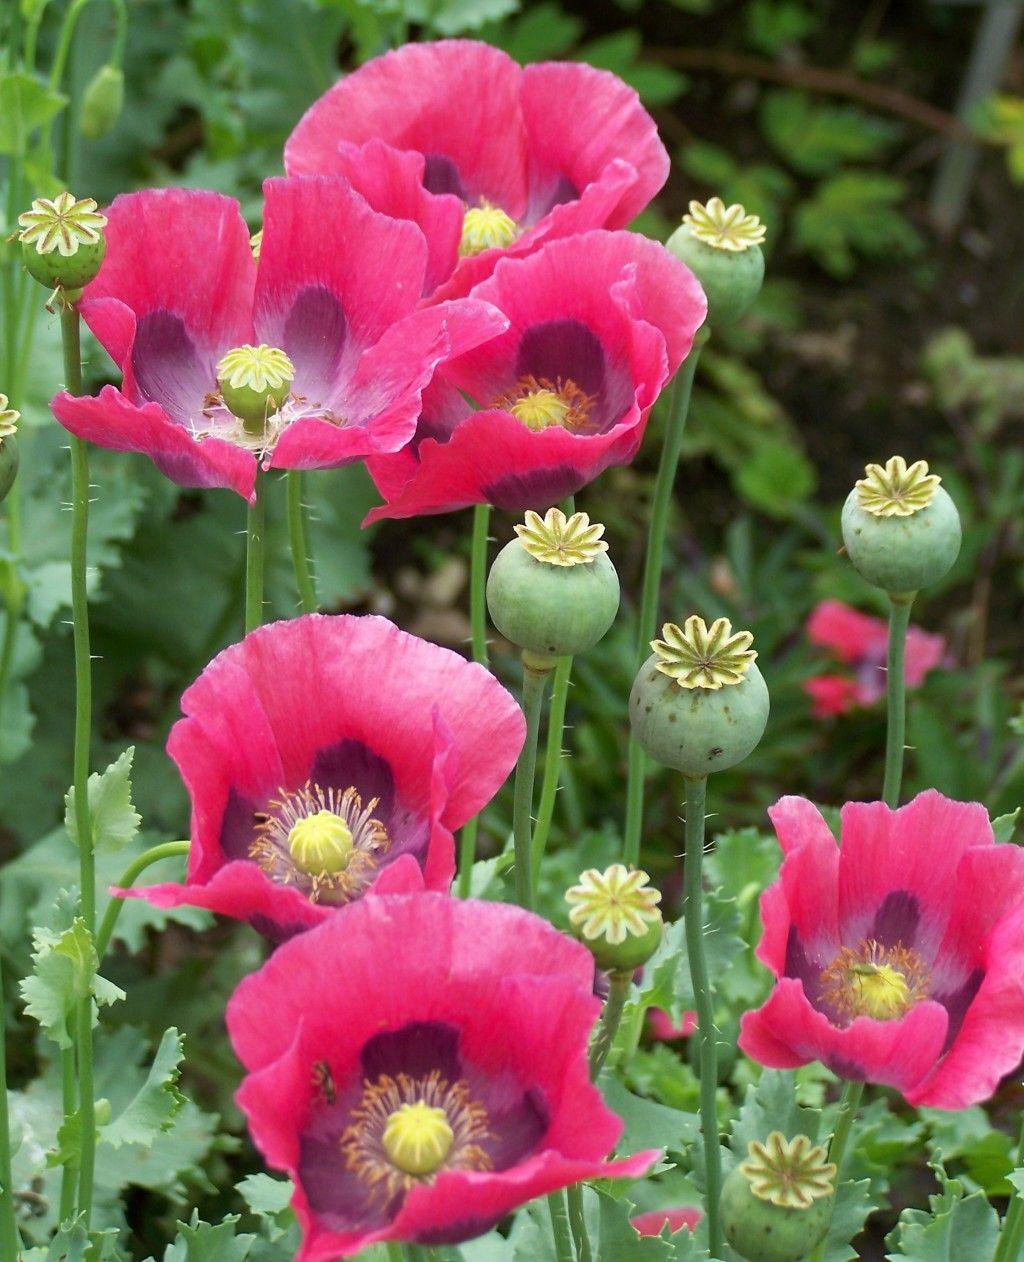 Opium Poppy Papaver Somniferumi Grow These In My Yard Got